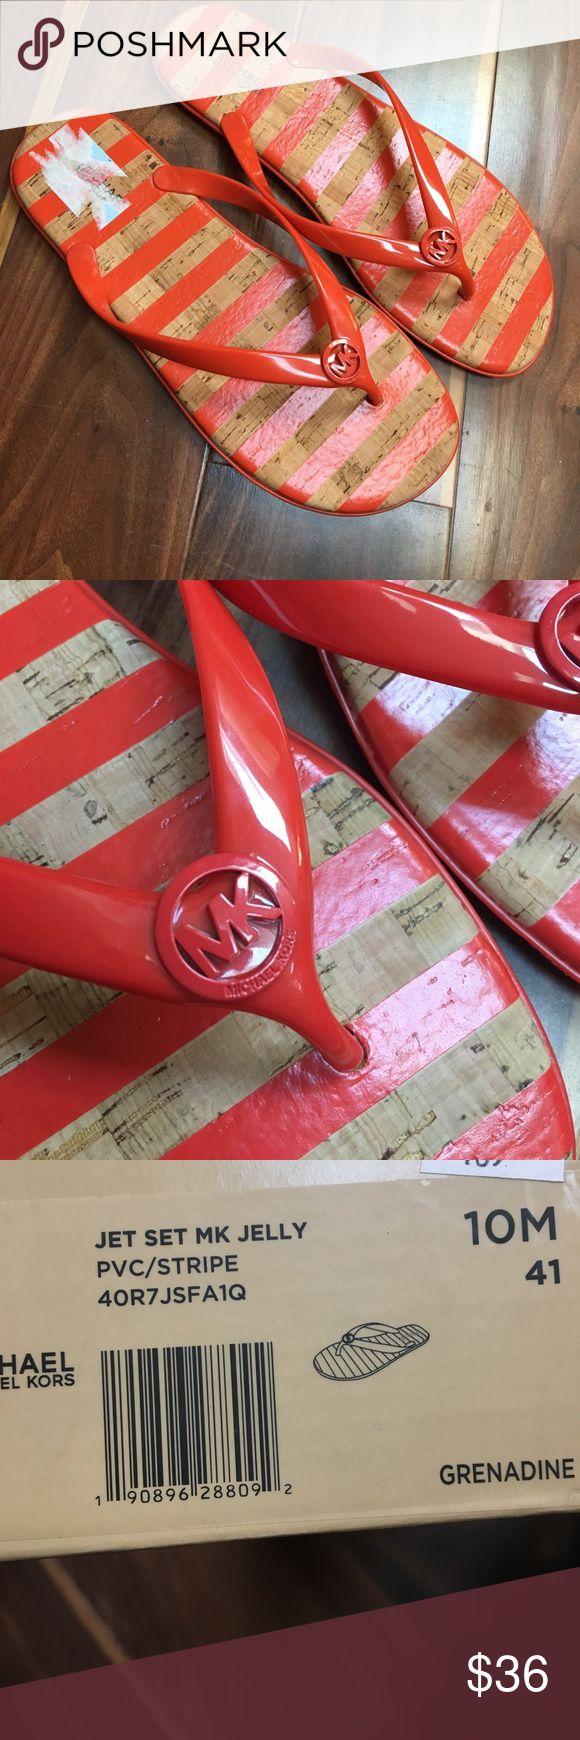 NIB Michael Kors Jet Set Jelly PVC Flip Flip sz 10 NO OFFERS, please!!  BRAND NEW in BOX  MK Jet Set Jelly PVC Stripe Flip Flops  Colors: GRENADINE  Size 10 Michael Kors Shoes Sandals